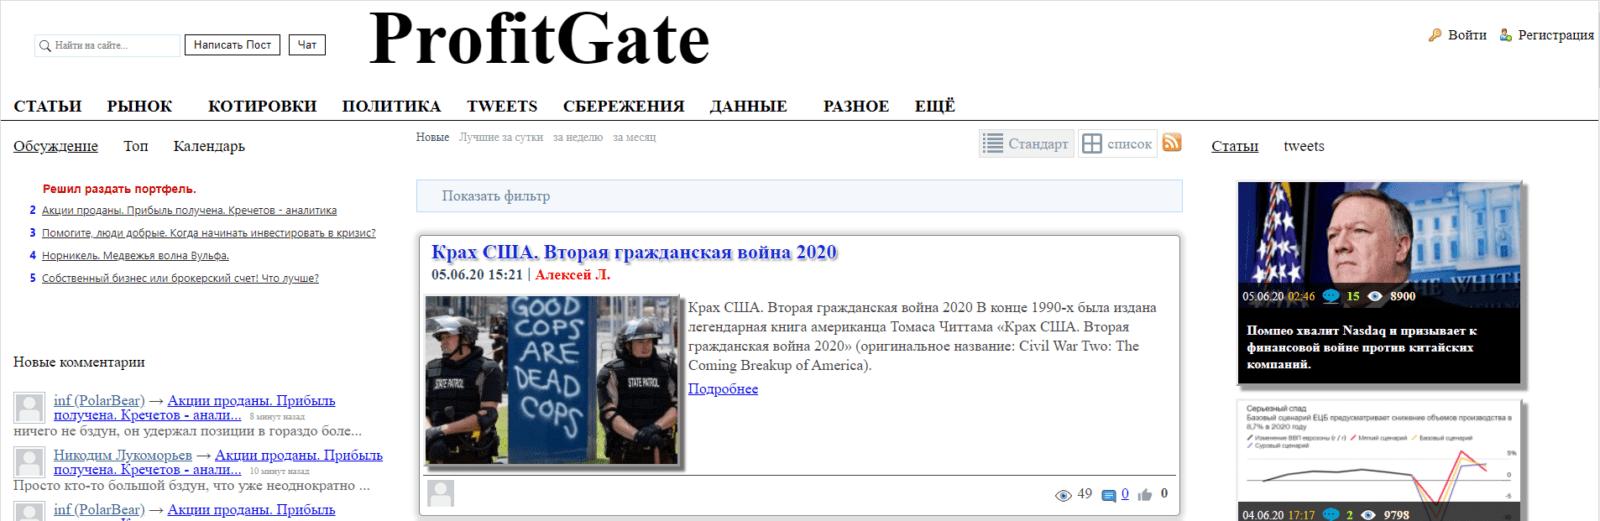 ProfitGate сайт